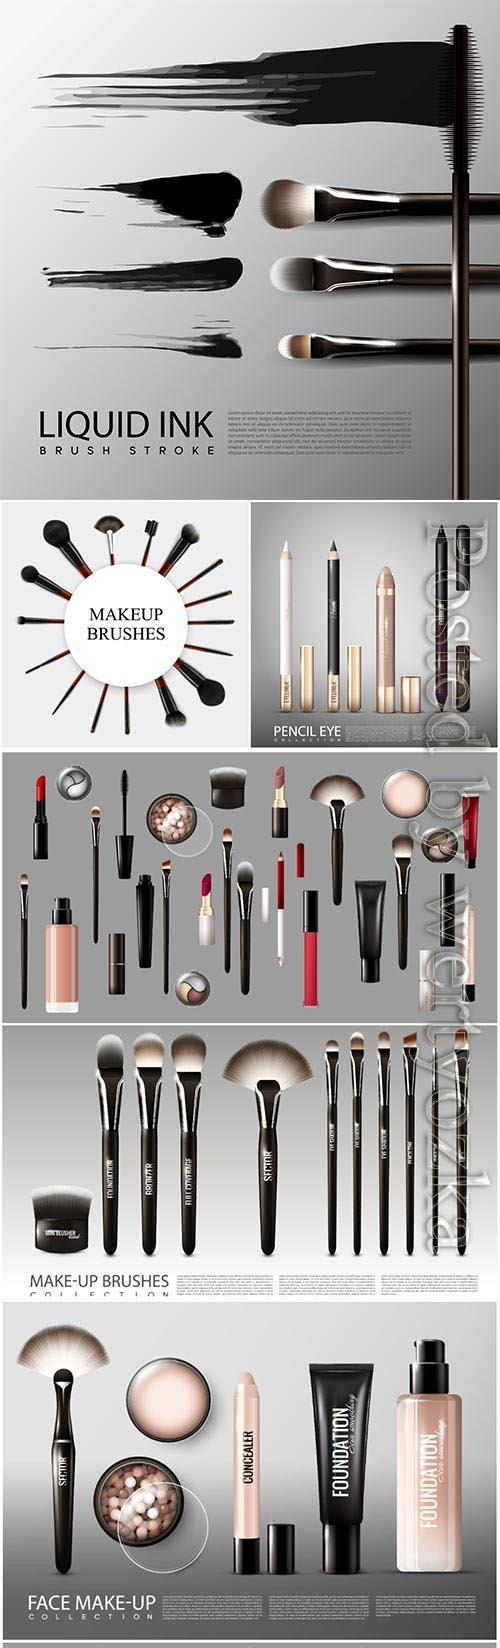 Realistic professional cosmetic tools set